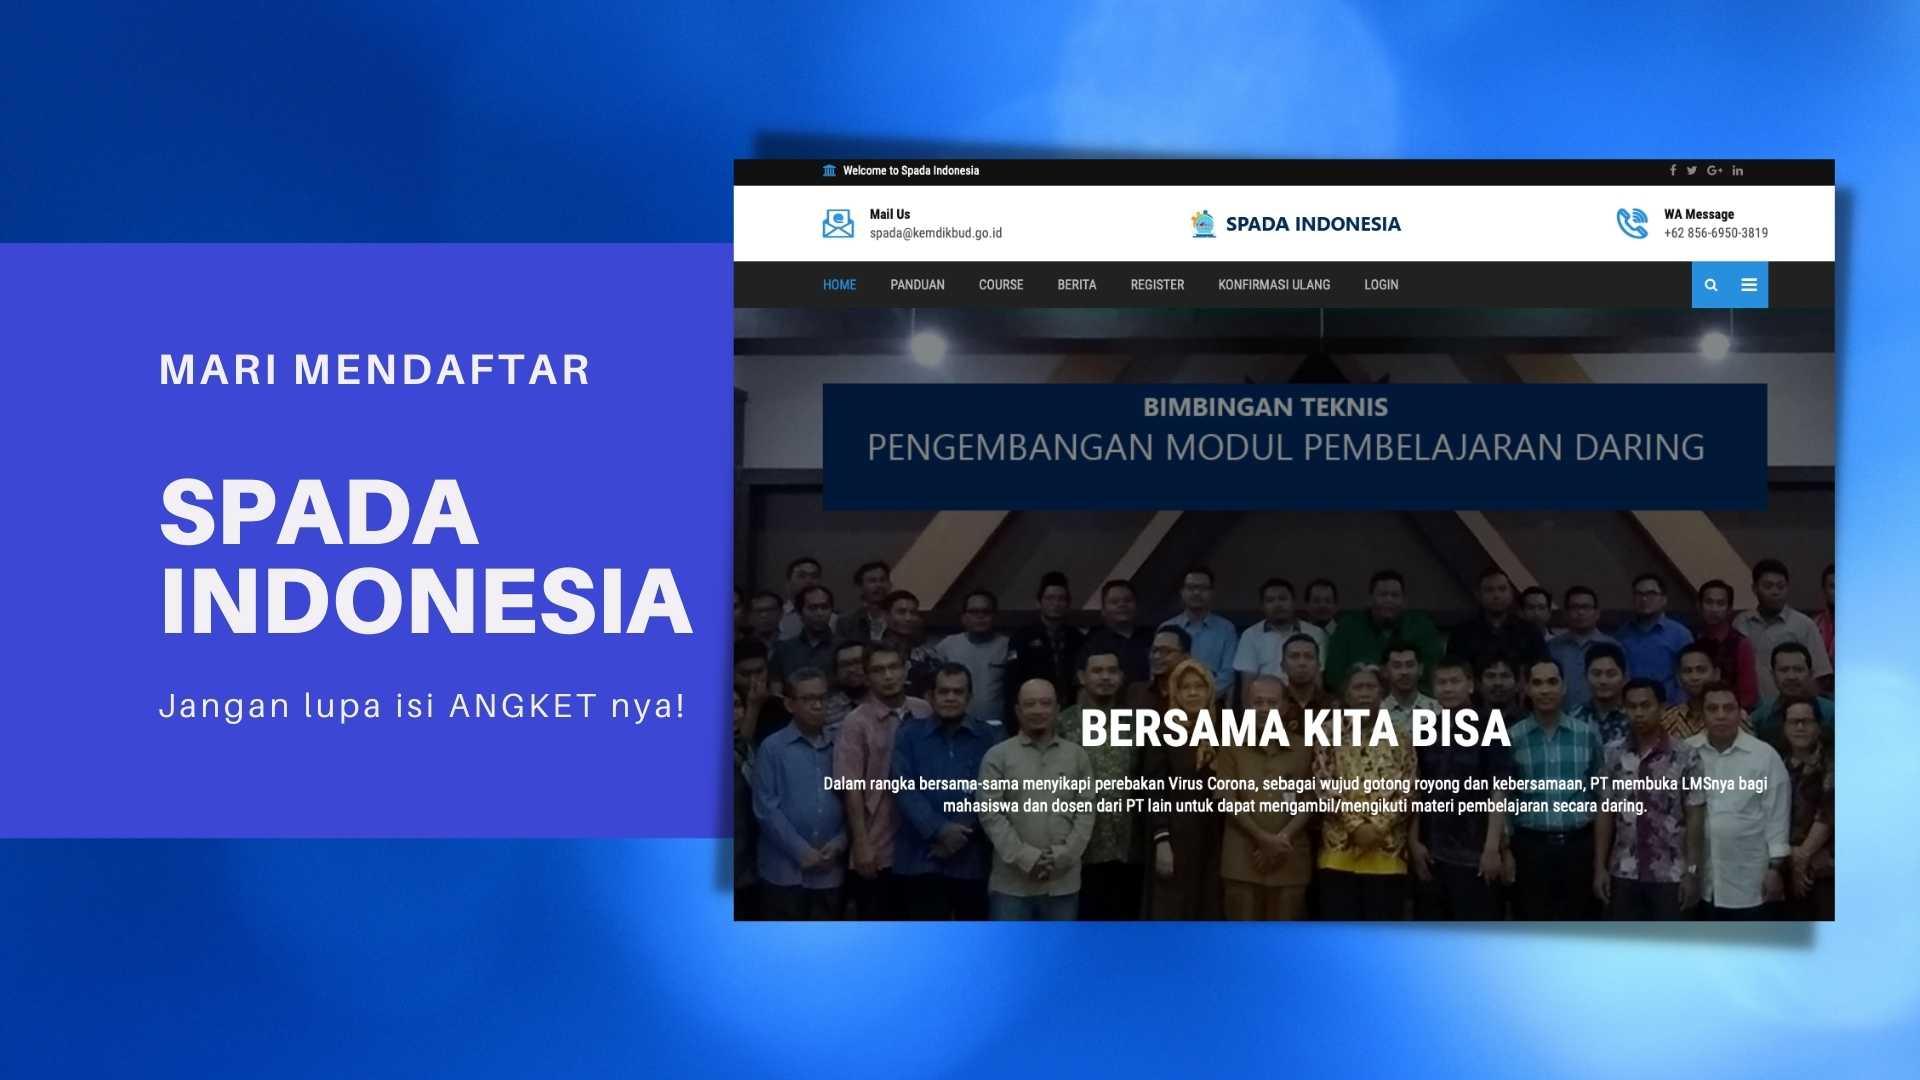 SPADA Indonesia